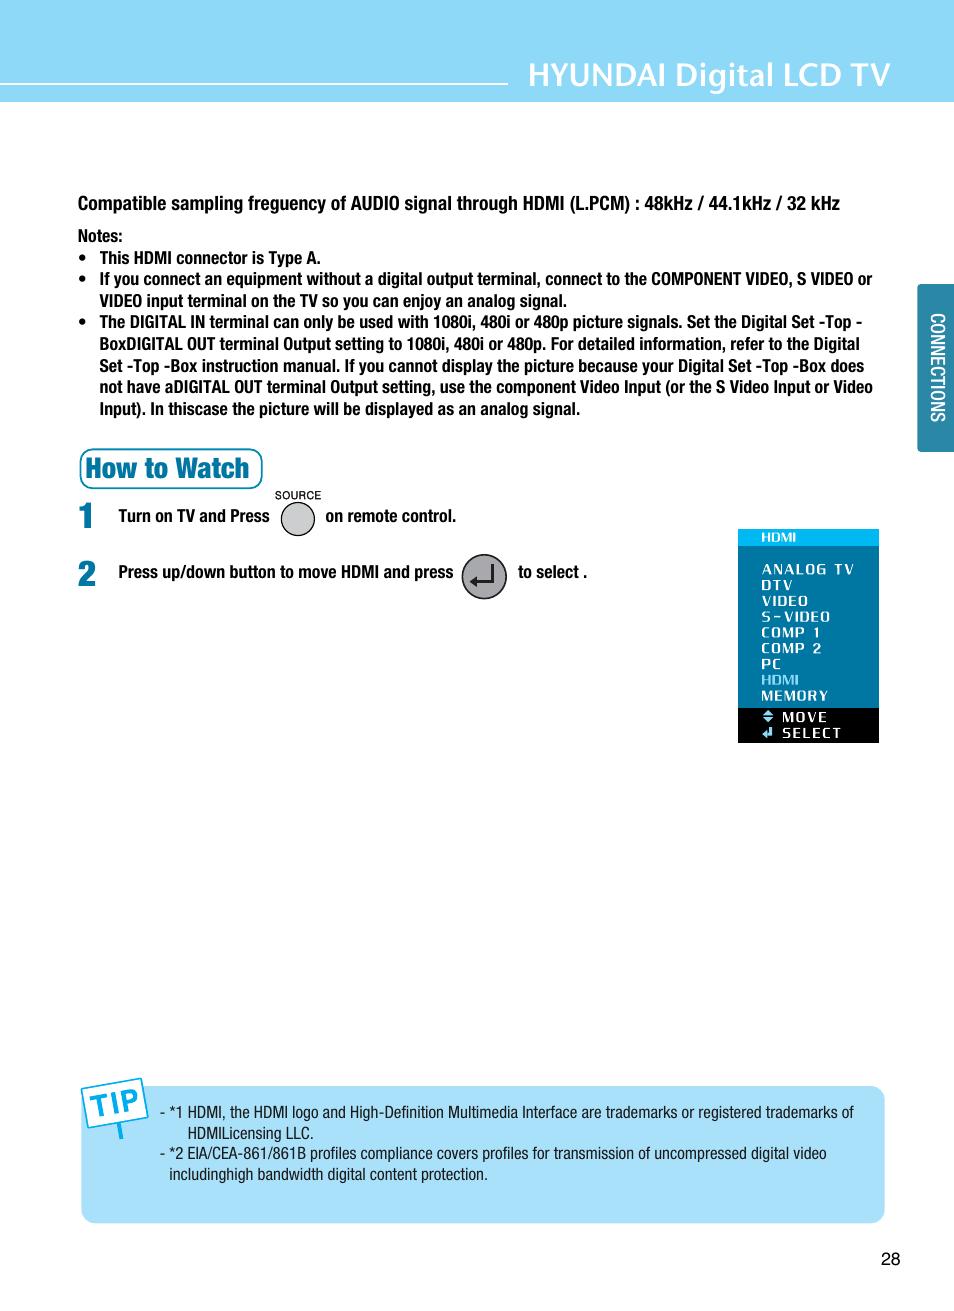 Hyundai digital lcd tv, How to watch | Hyundai ImageQuest